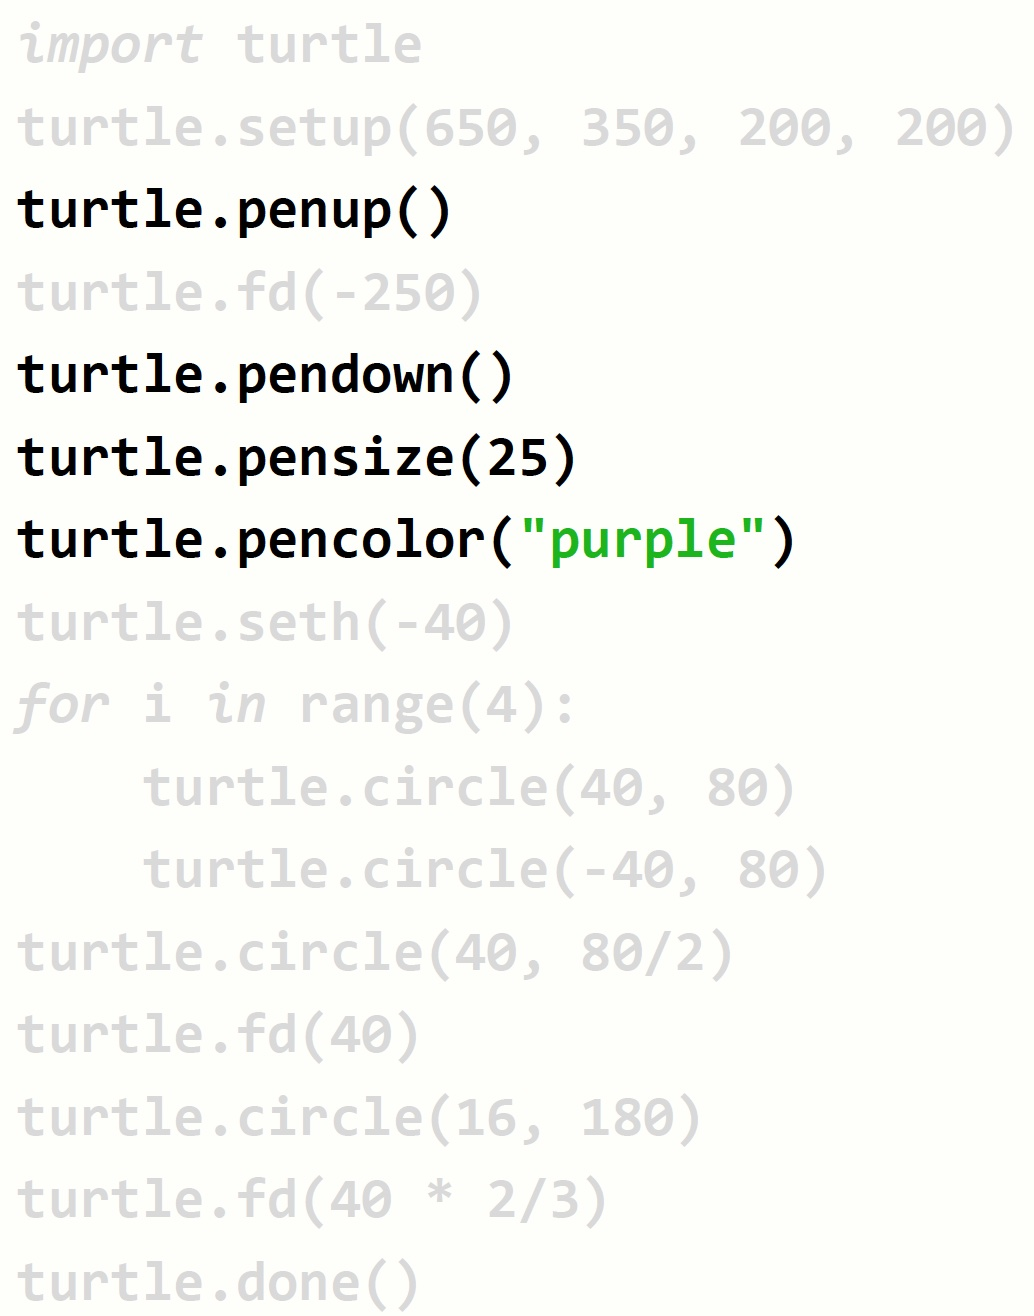 013-turtle程序语法元素分析-04.jpg?x-oss-process=style/watermark